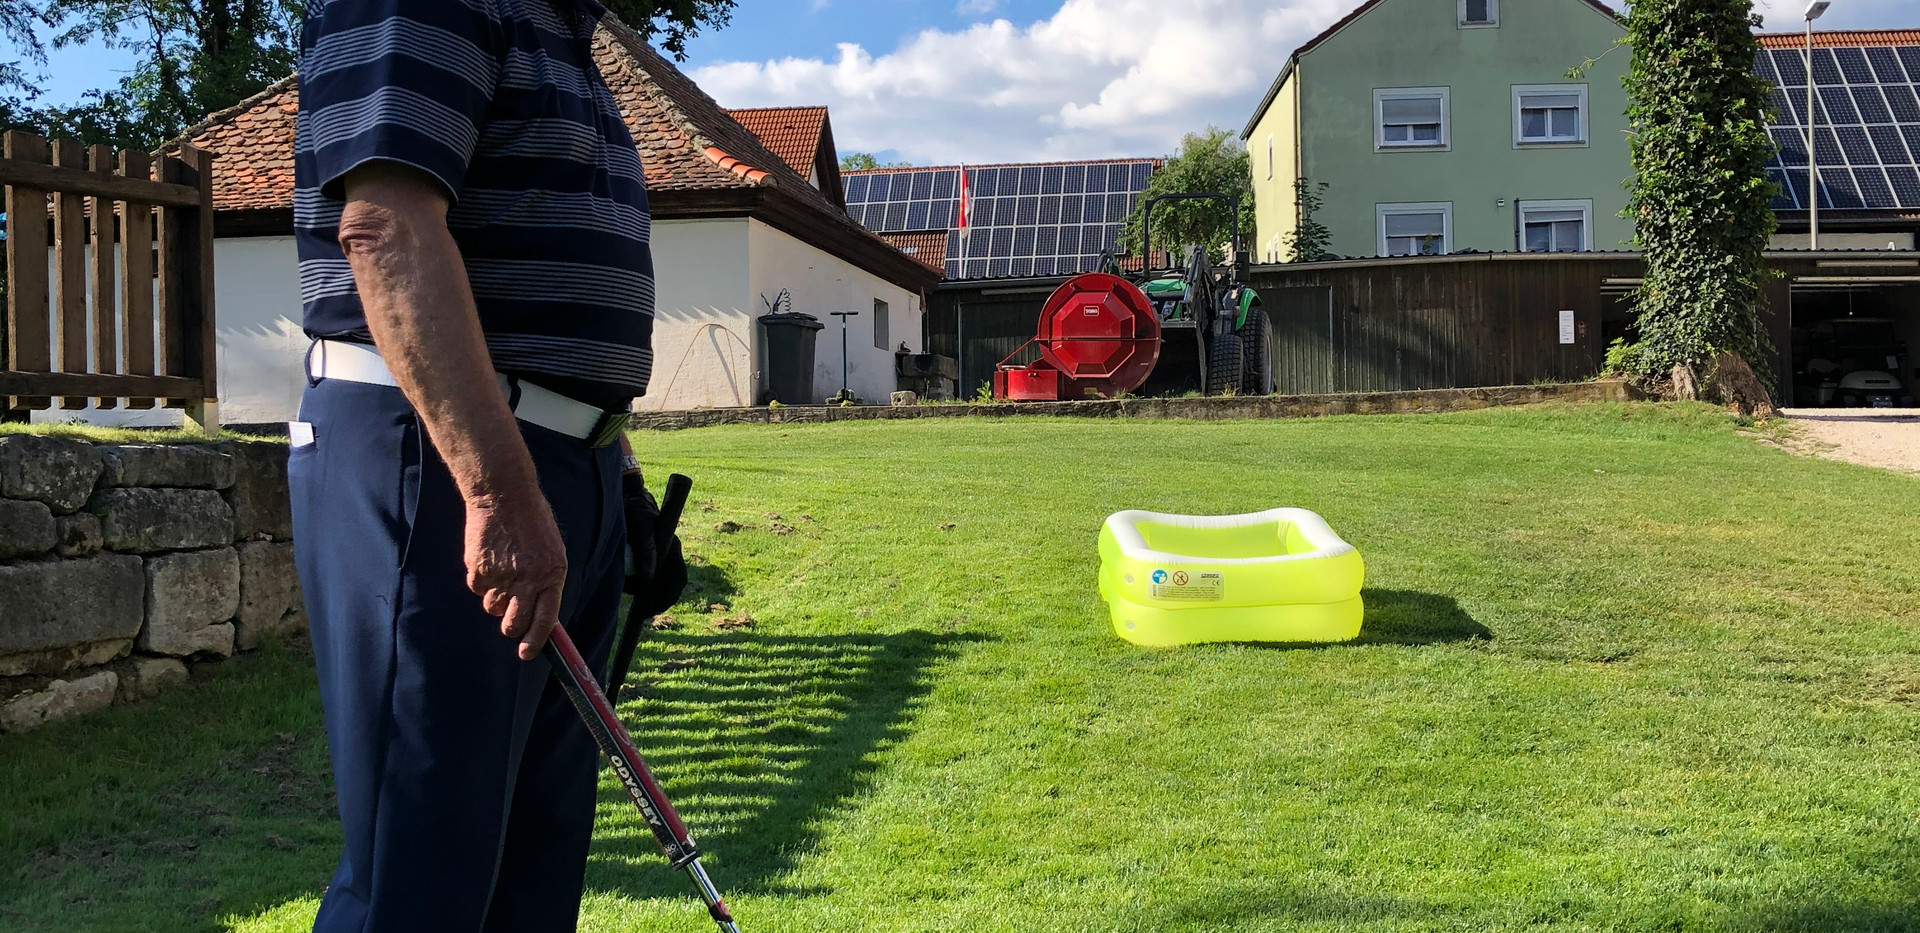 Mini Golf Bahn 4